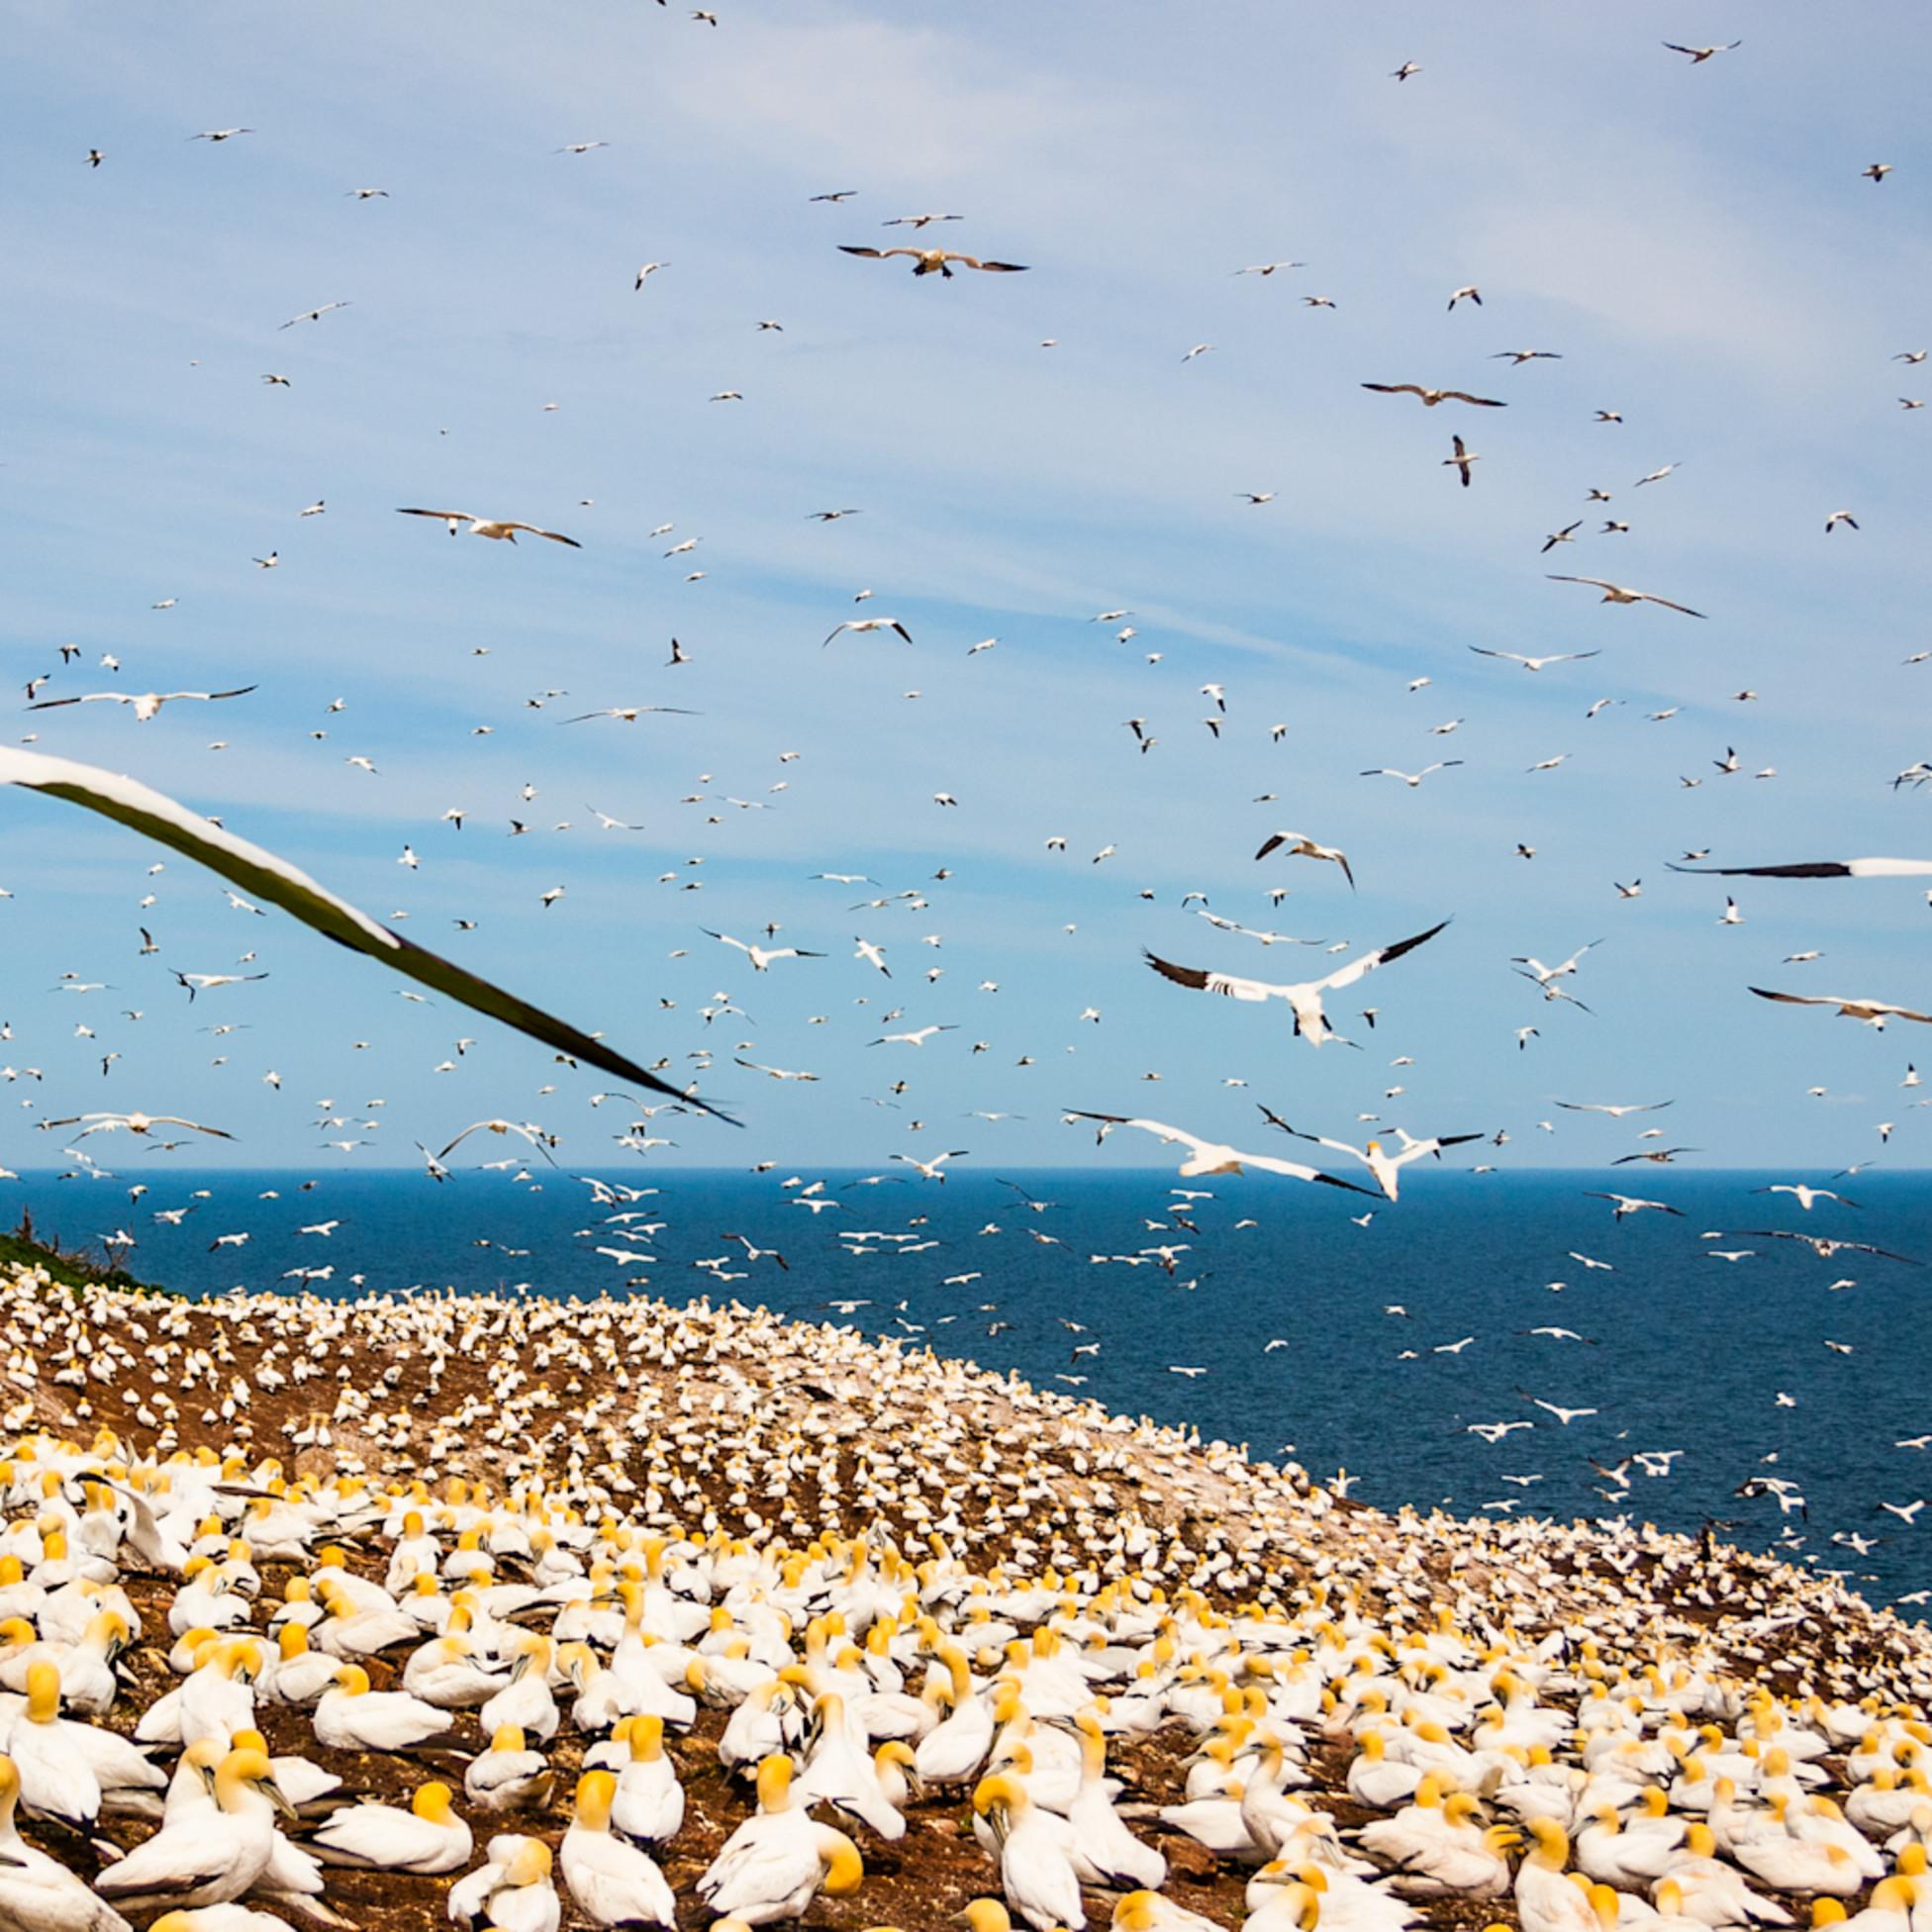 Northern gannets c7euhx